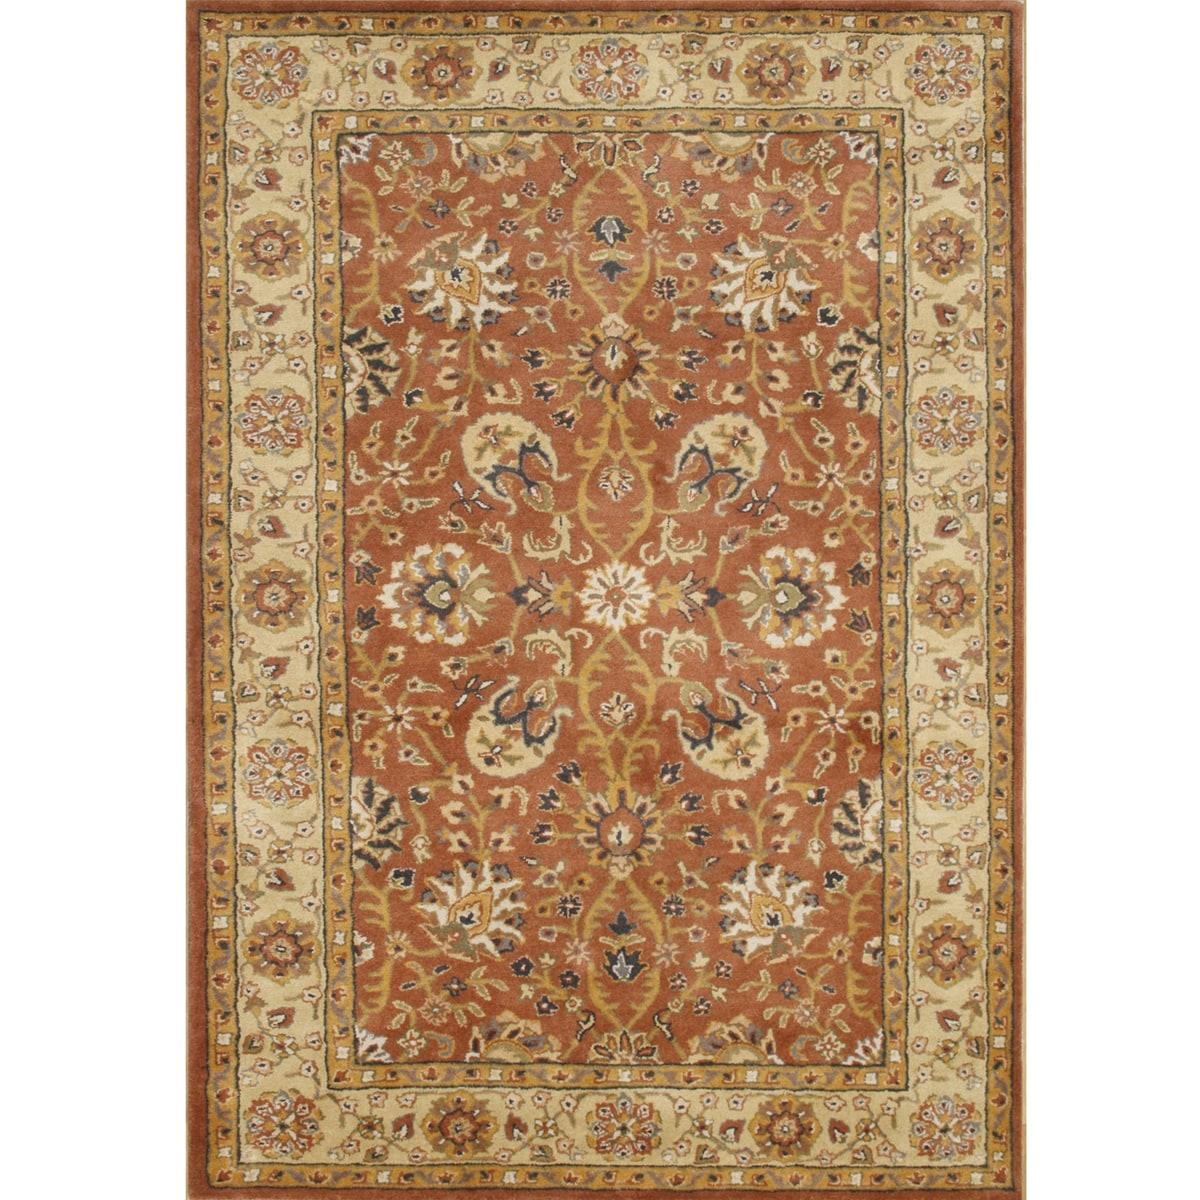 Handmade TajMahal Orange Wool Rug (8' x 10')